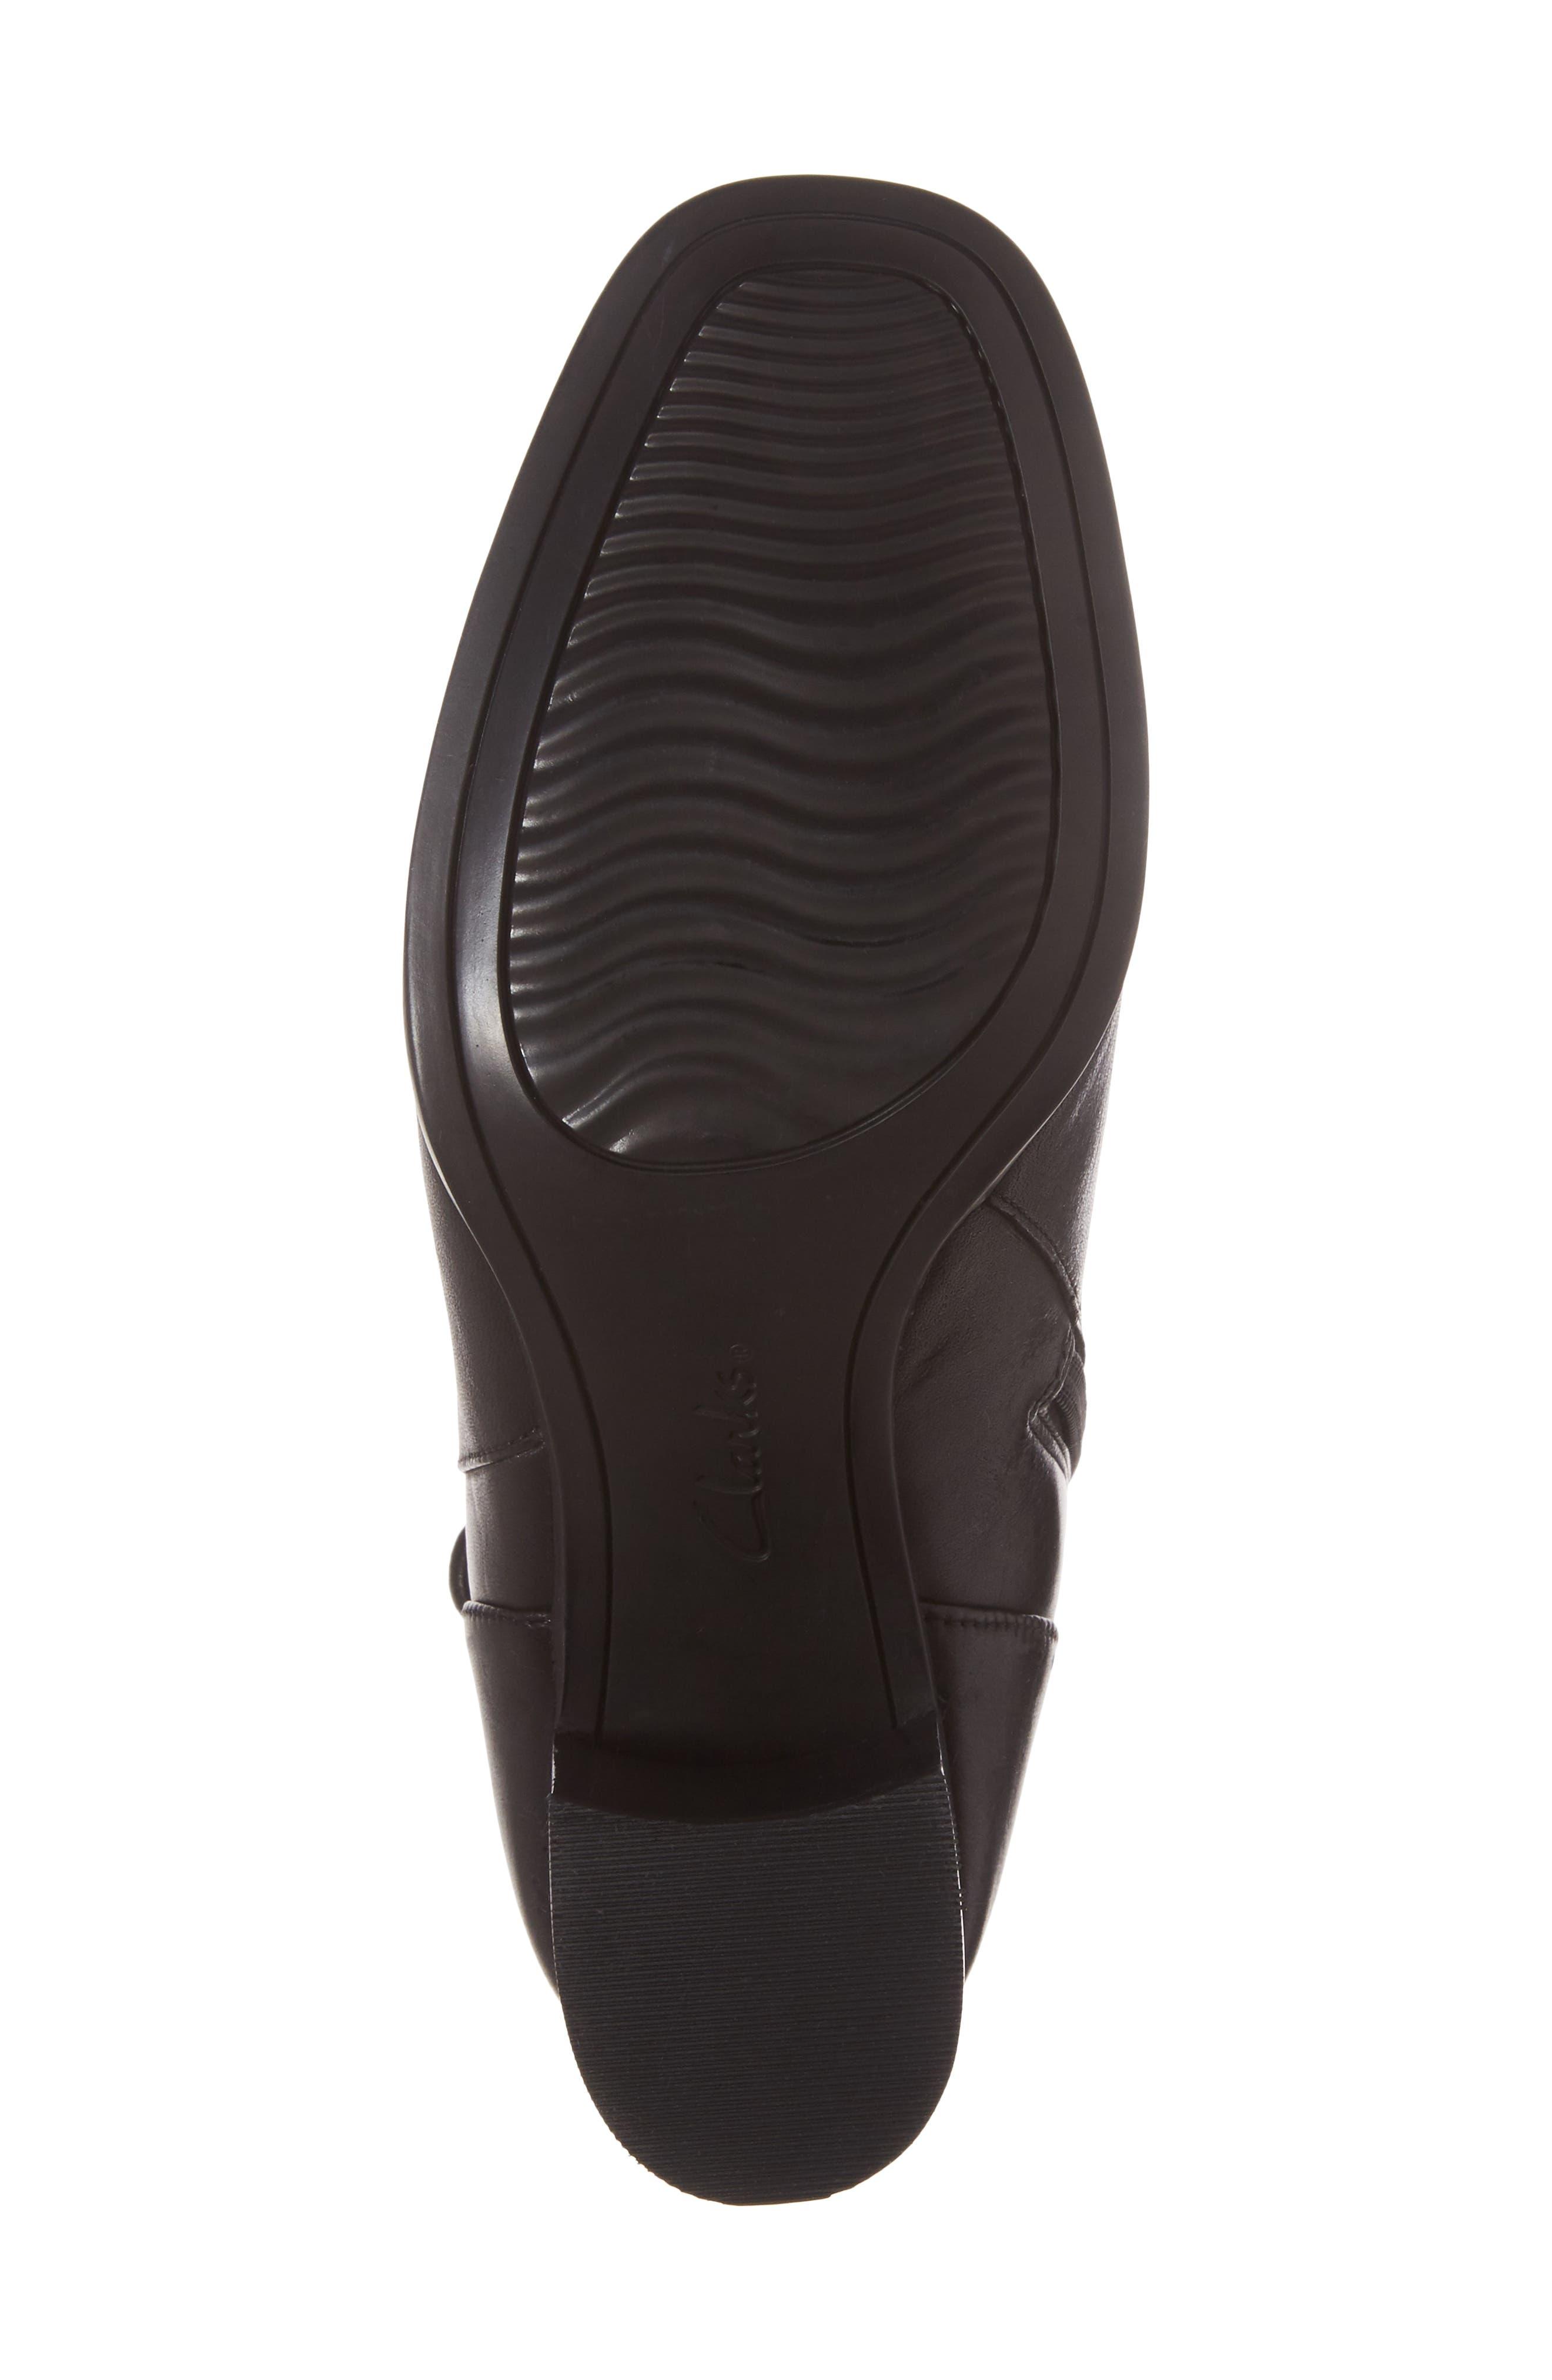 Kensett Diana Bootie,                             Alternate thumbnail 6, color,                             Black Leather